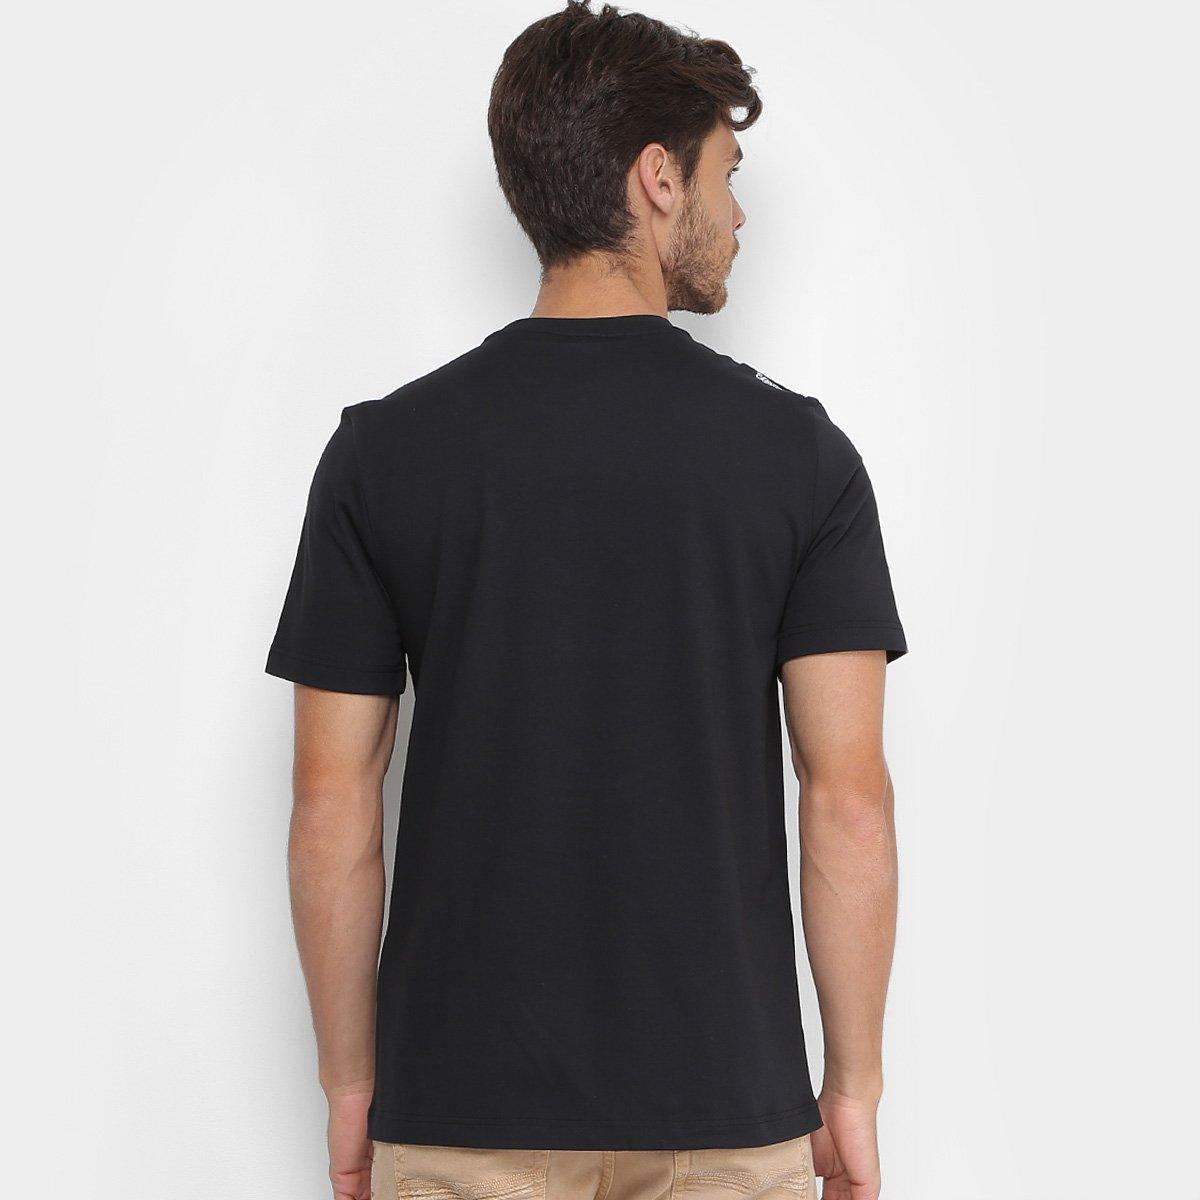 Camiseta Lacoste Live Estampada Masculina  Camiseta Lacoste Live Estampada  Masculina ... 2b9e635151ac5